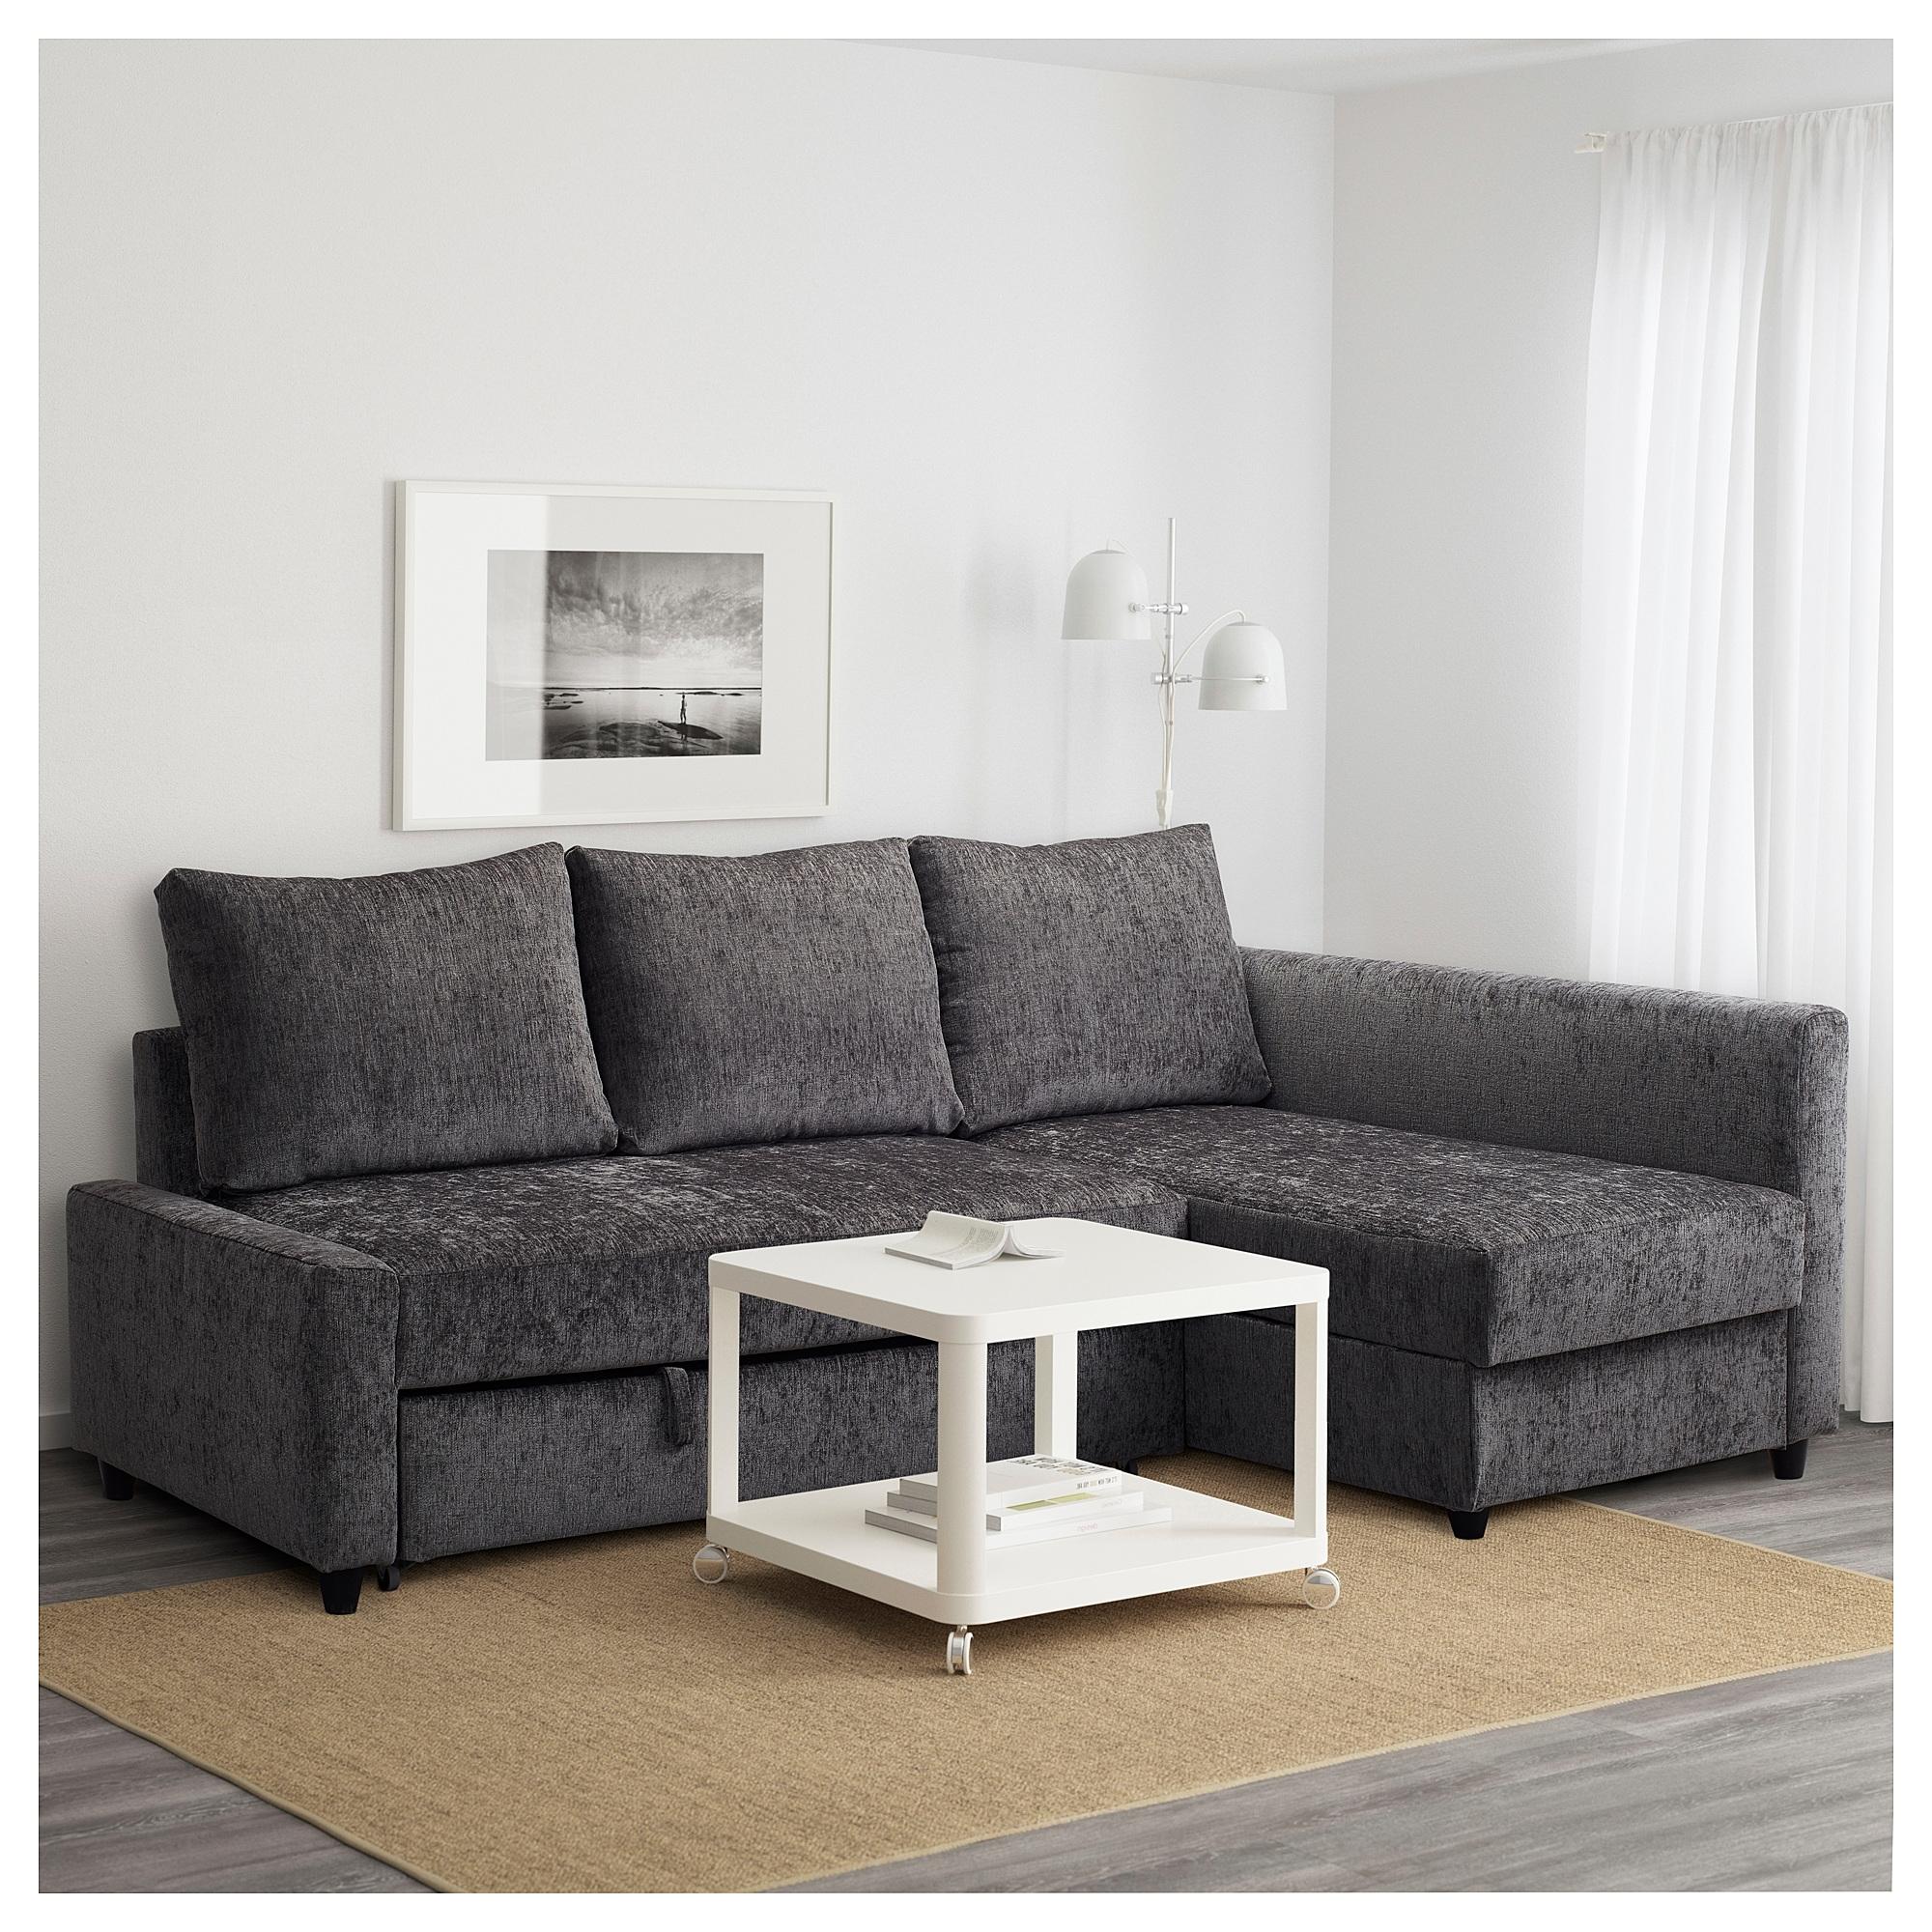 Friheten Corner Sofa Bed With Storage Dark Grey – Ikea Pertaining To Latest Ikea Corner Sofas With Storage (View 6 of 15)